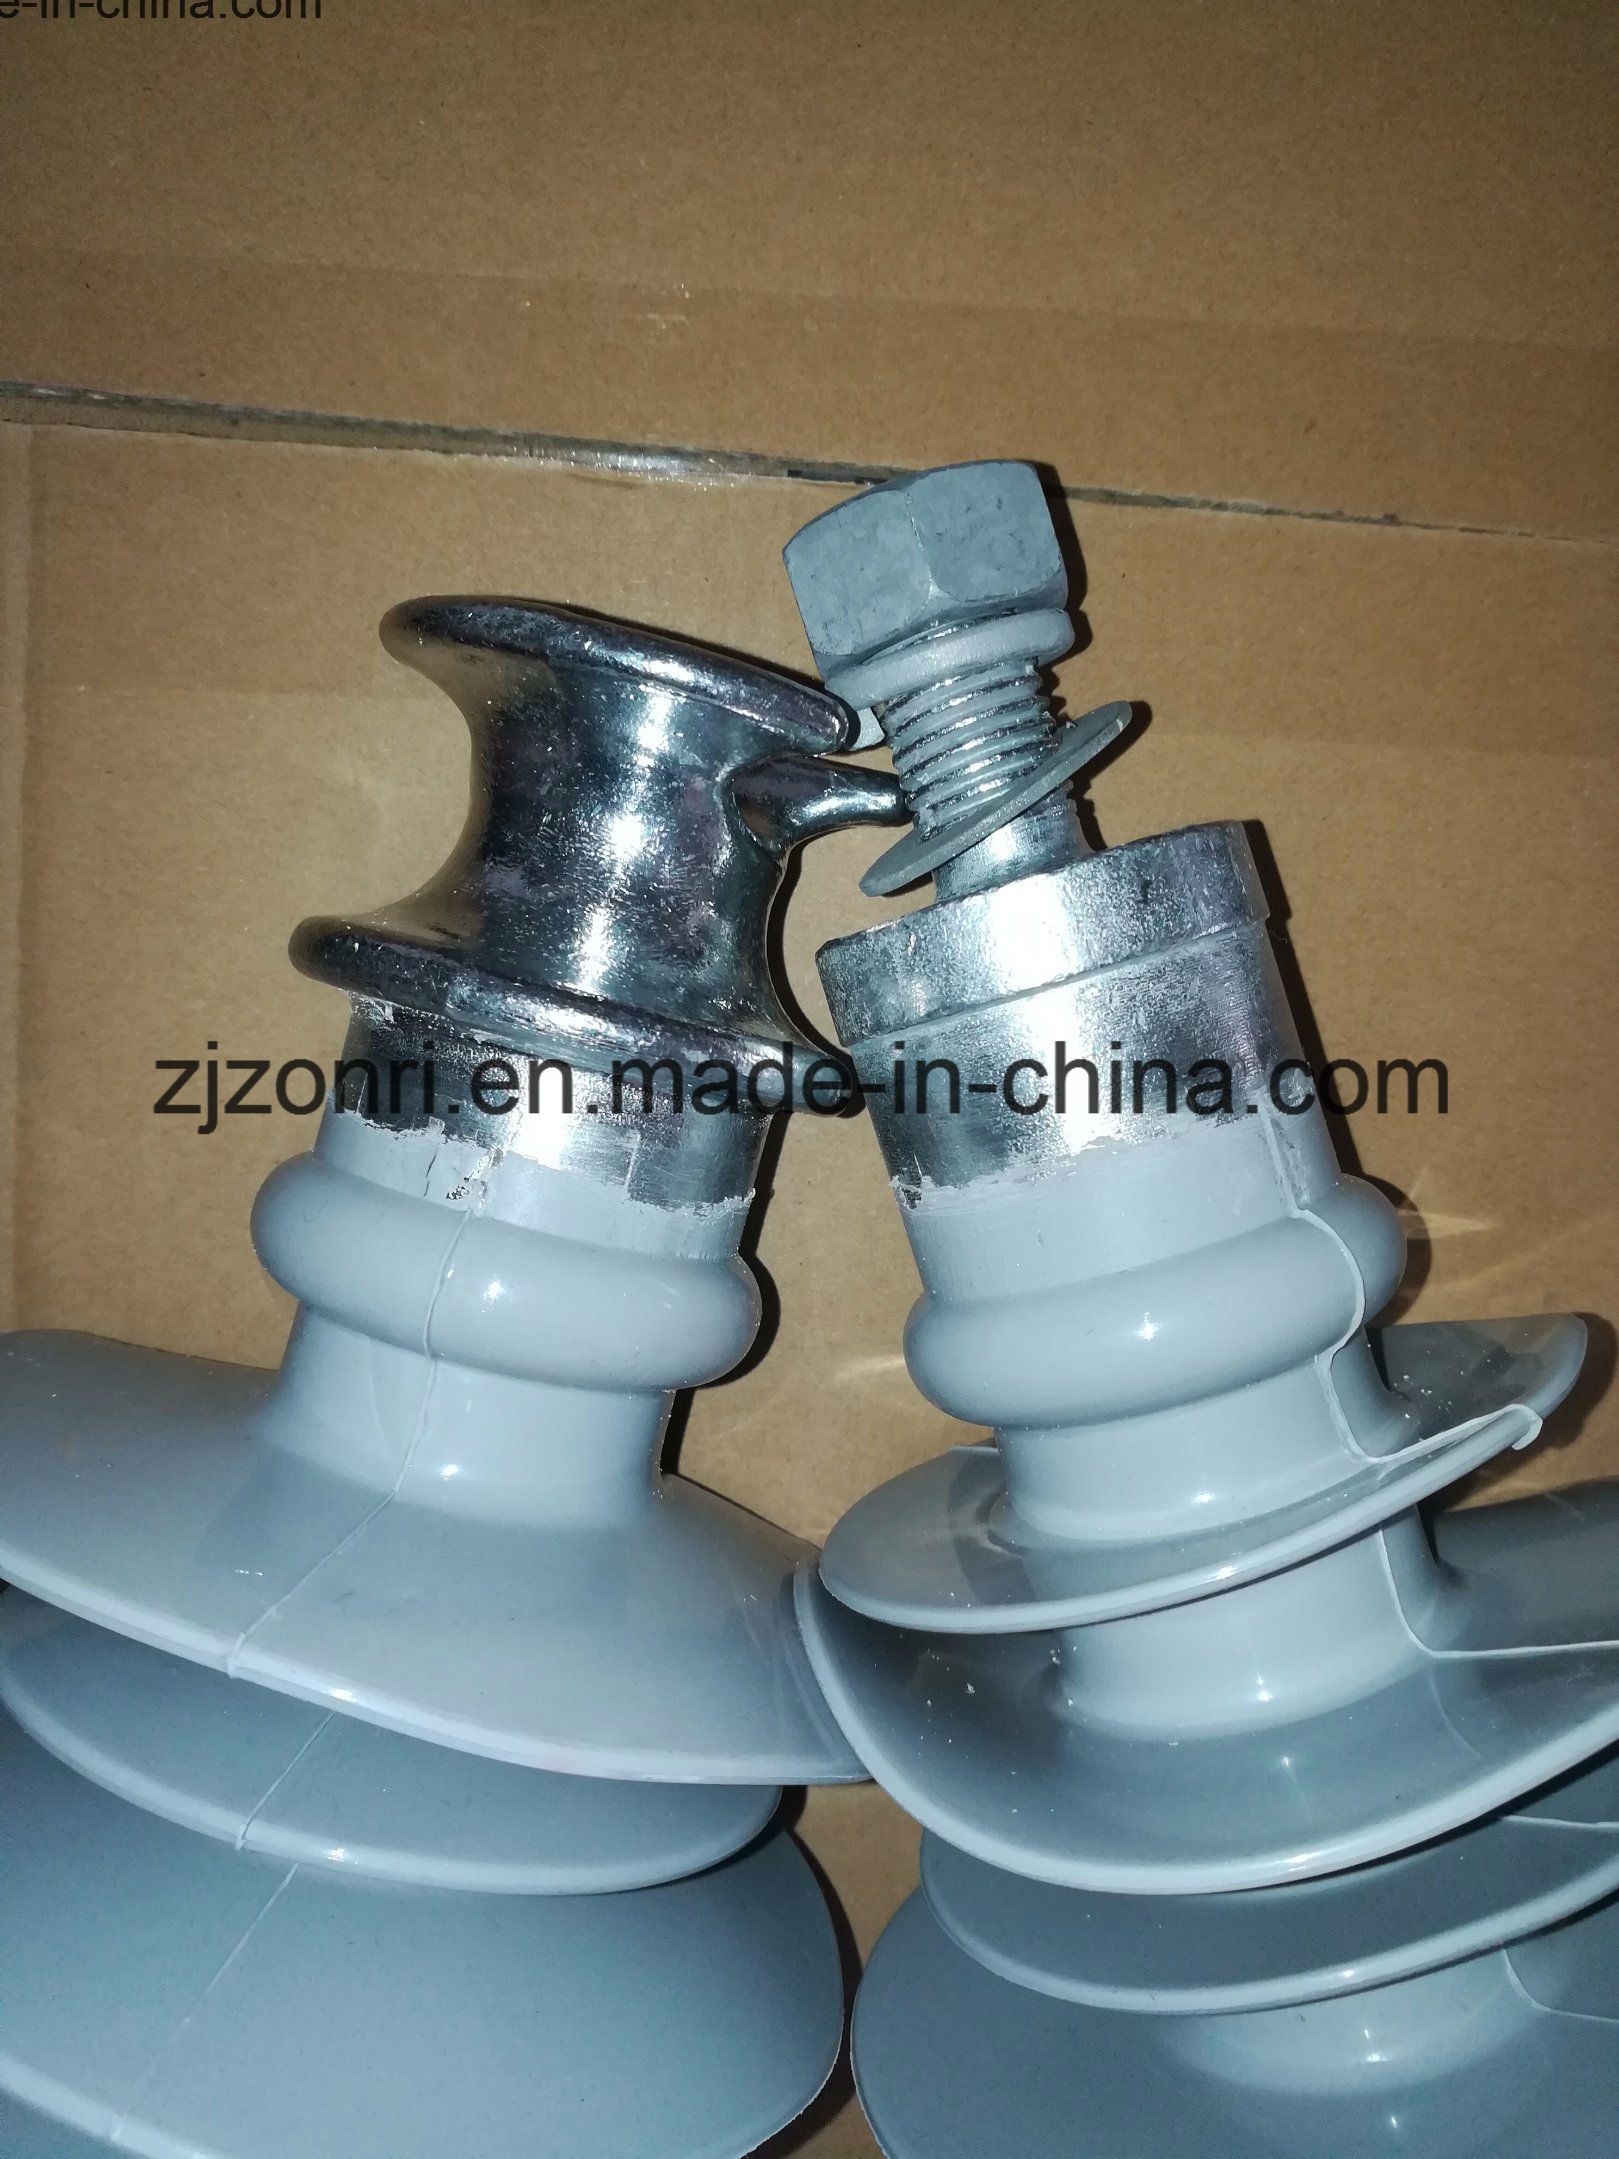 High Voltage Pin Type Composite Insulator Fpq-24/8 11